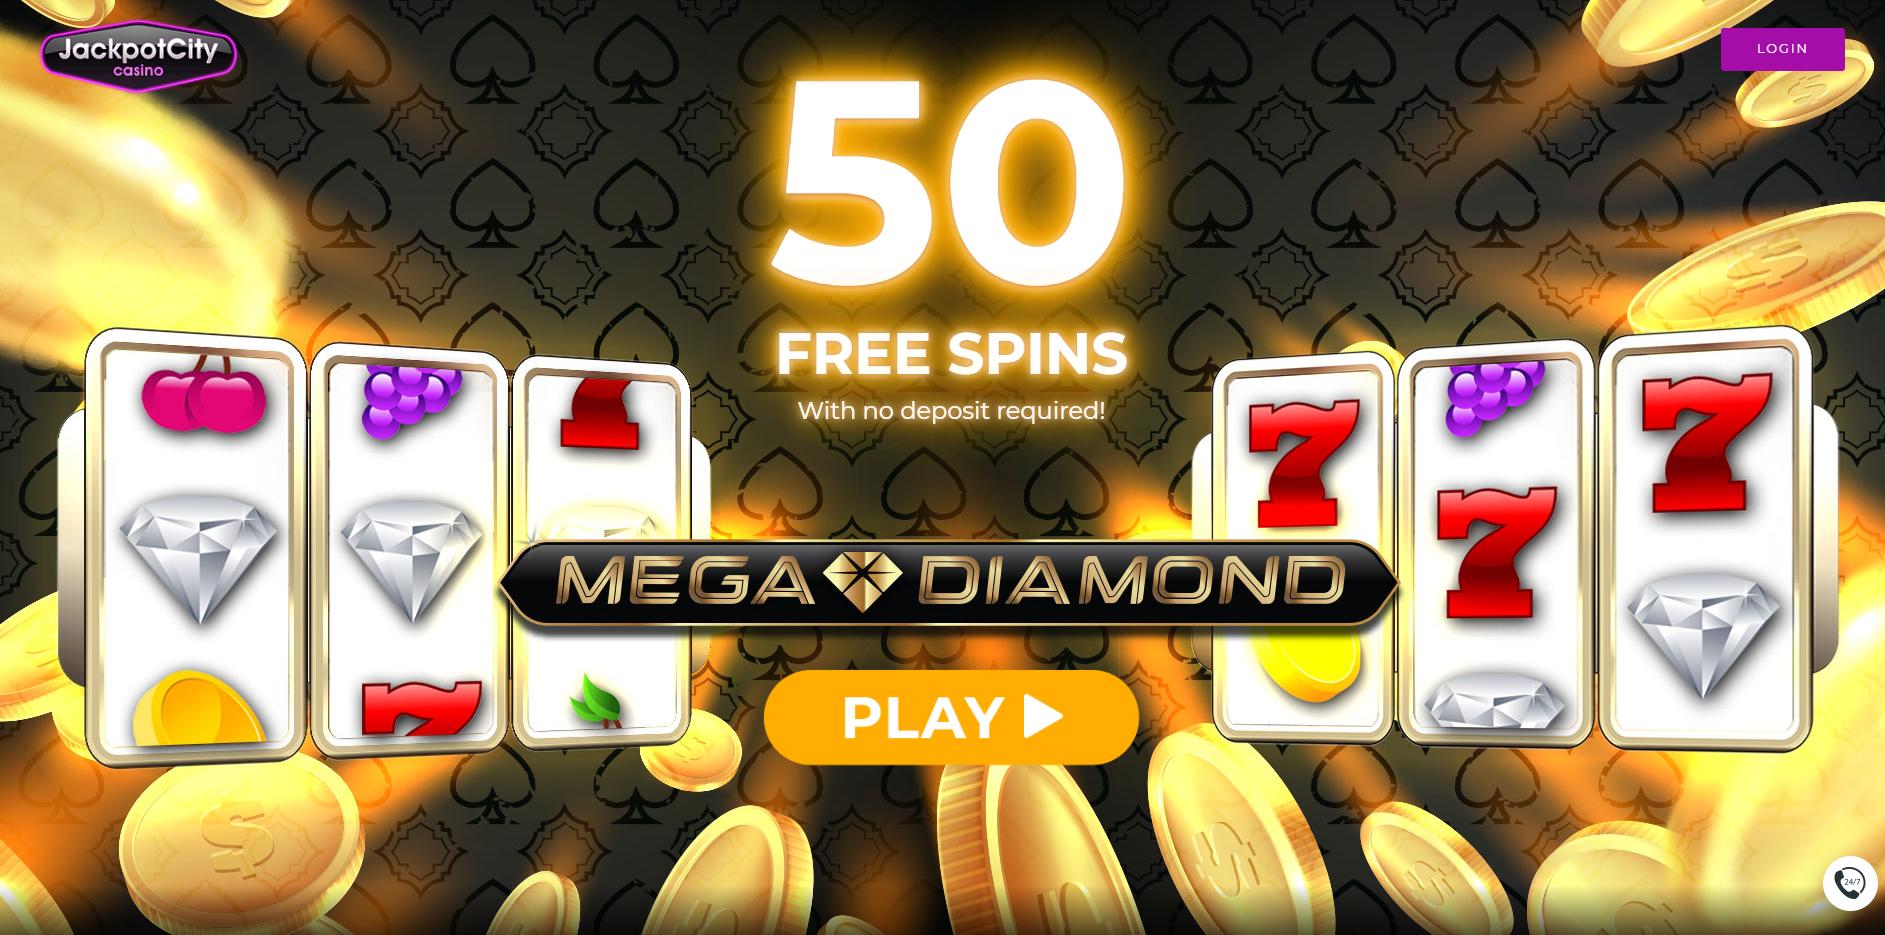 Jackpot City Casino 50 Gratis Spins No Deposit Bonus! | Free spins, Casino,  Casino bonus